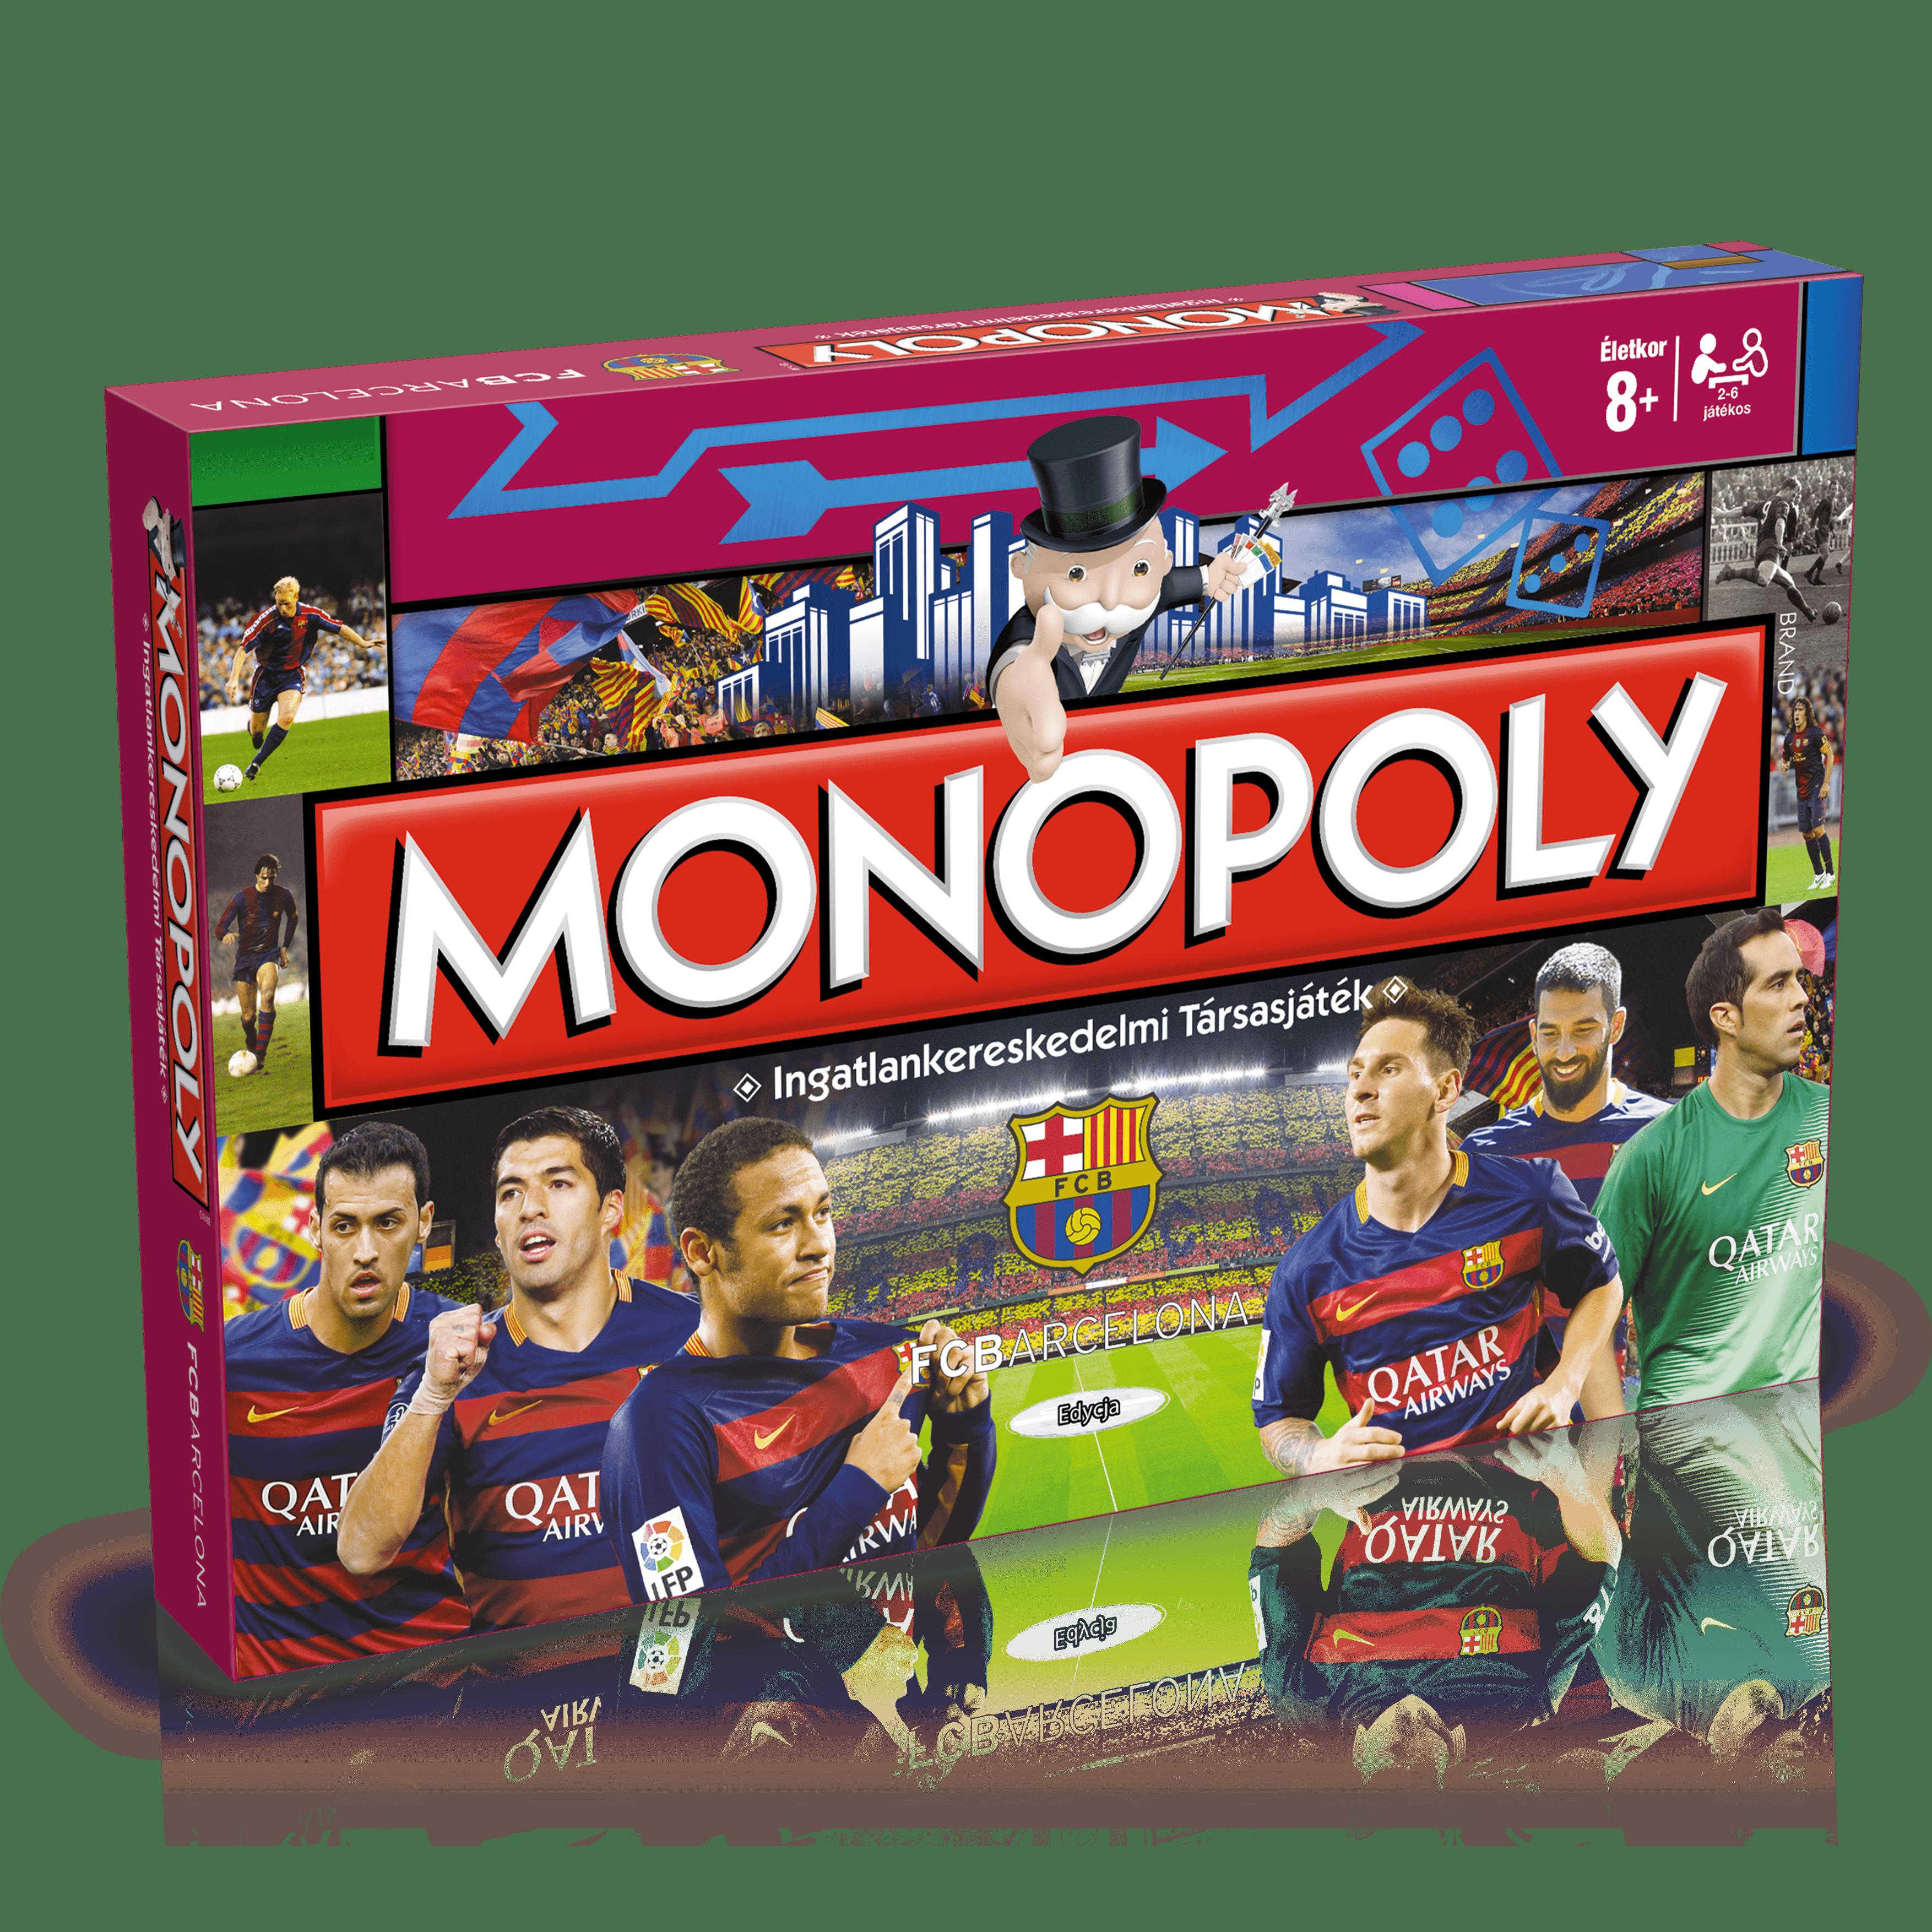 Monopoly Imperium Anleitung